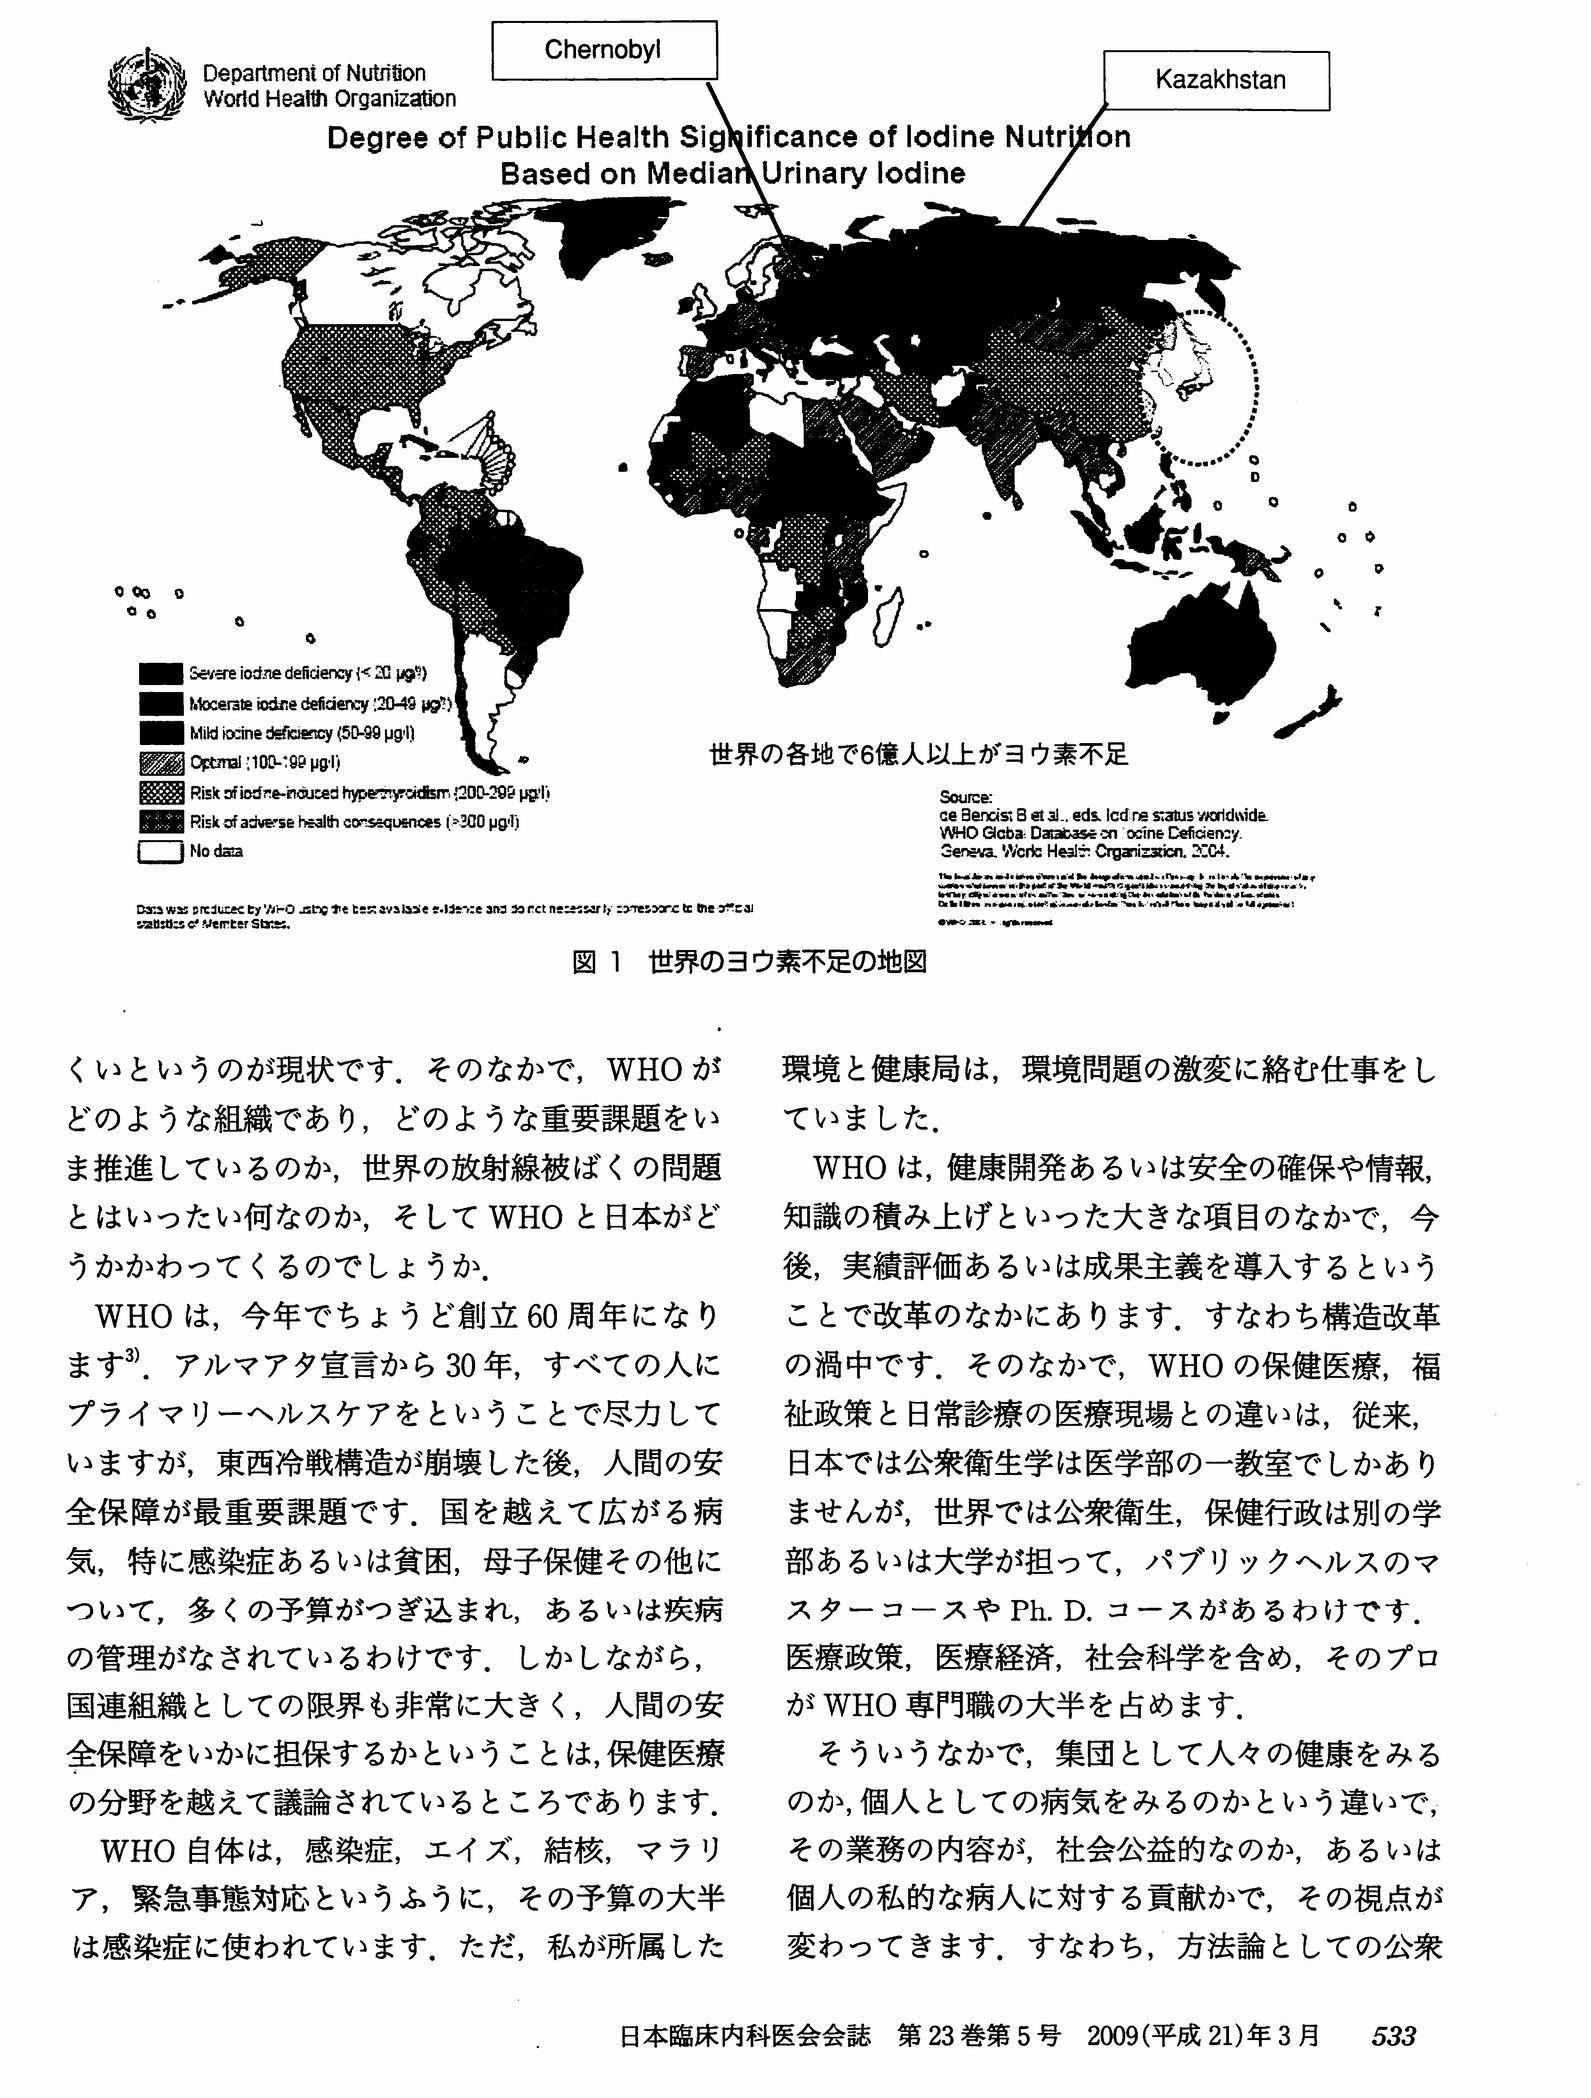 山下俊一講演「放射線の光と影」2009年3月 日本臨床内科医会